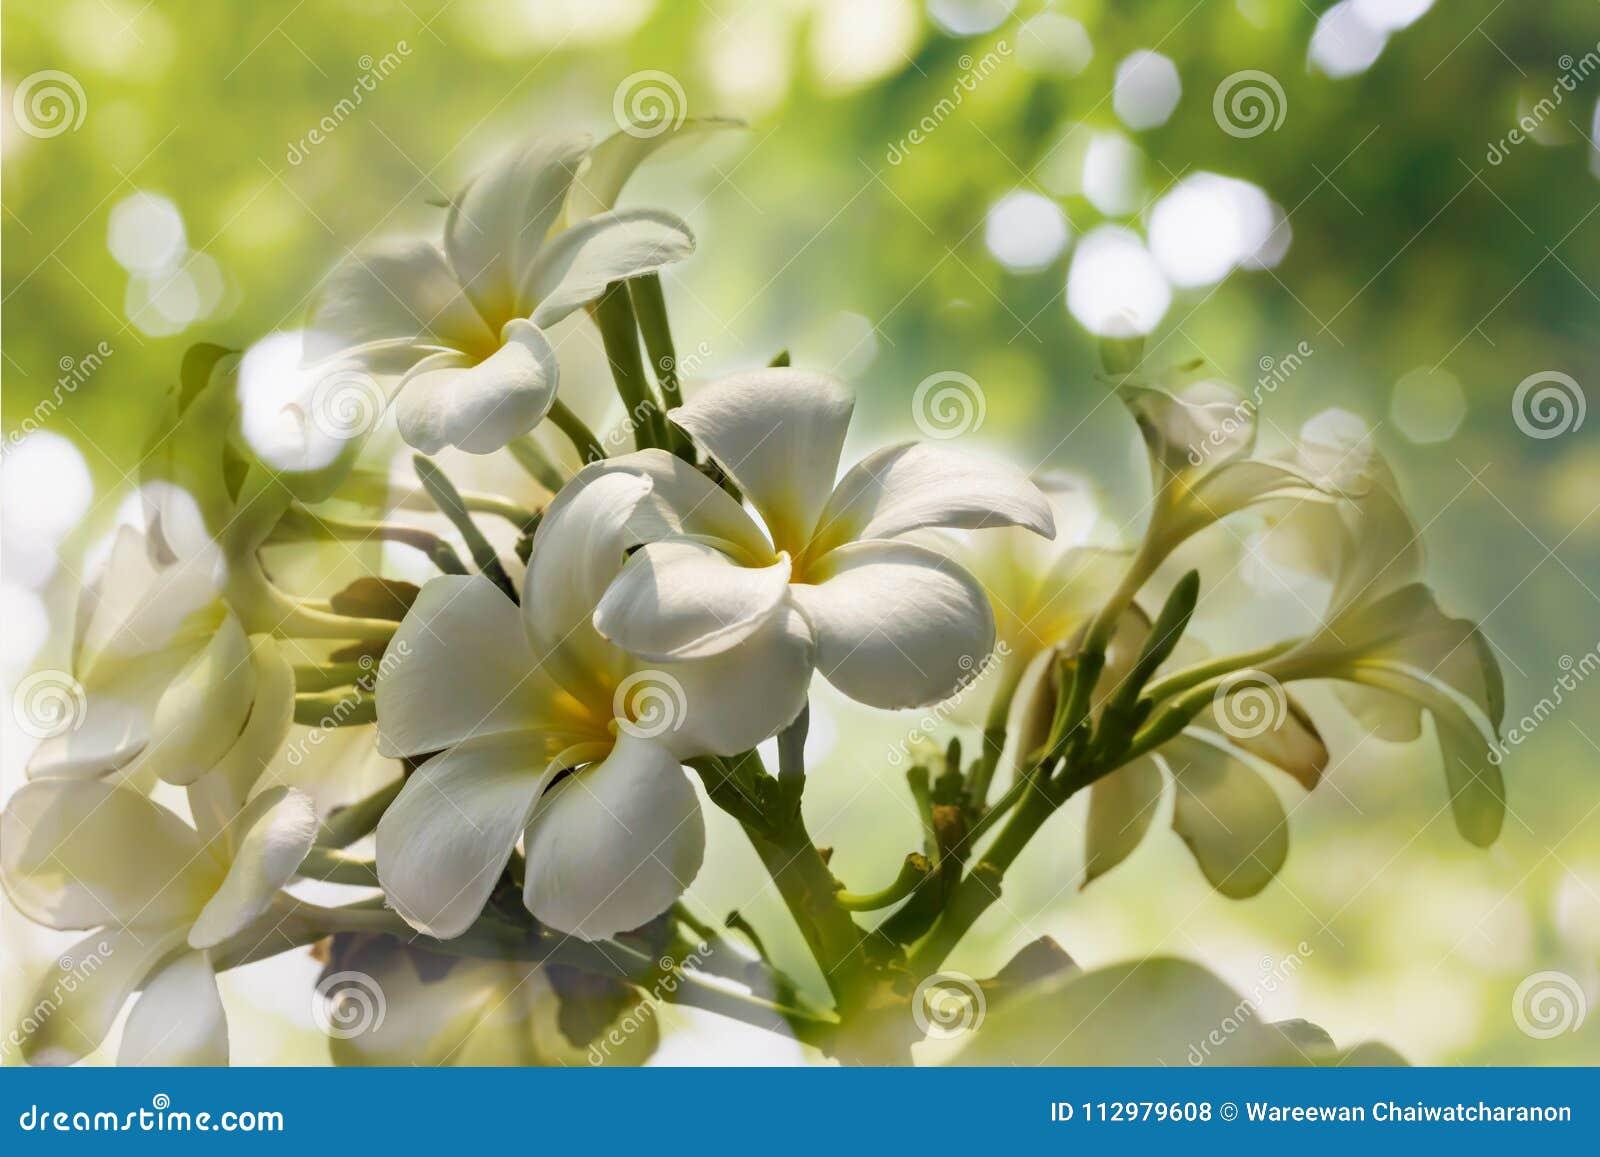 White flower bunch plumeria or frangipany in tree bokeh for summer background